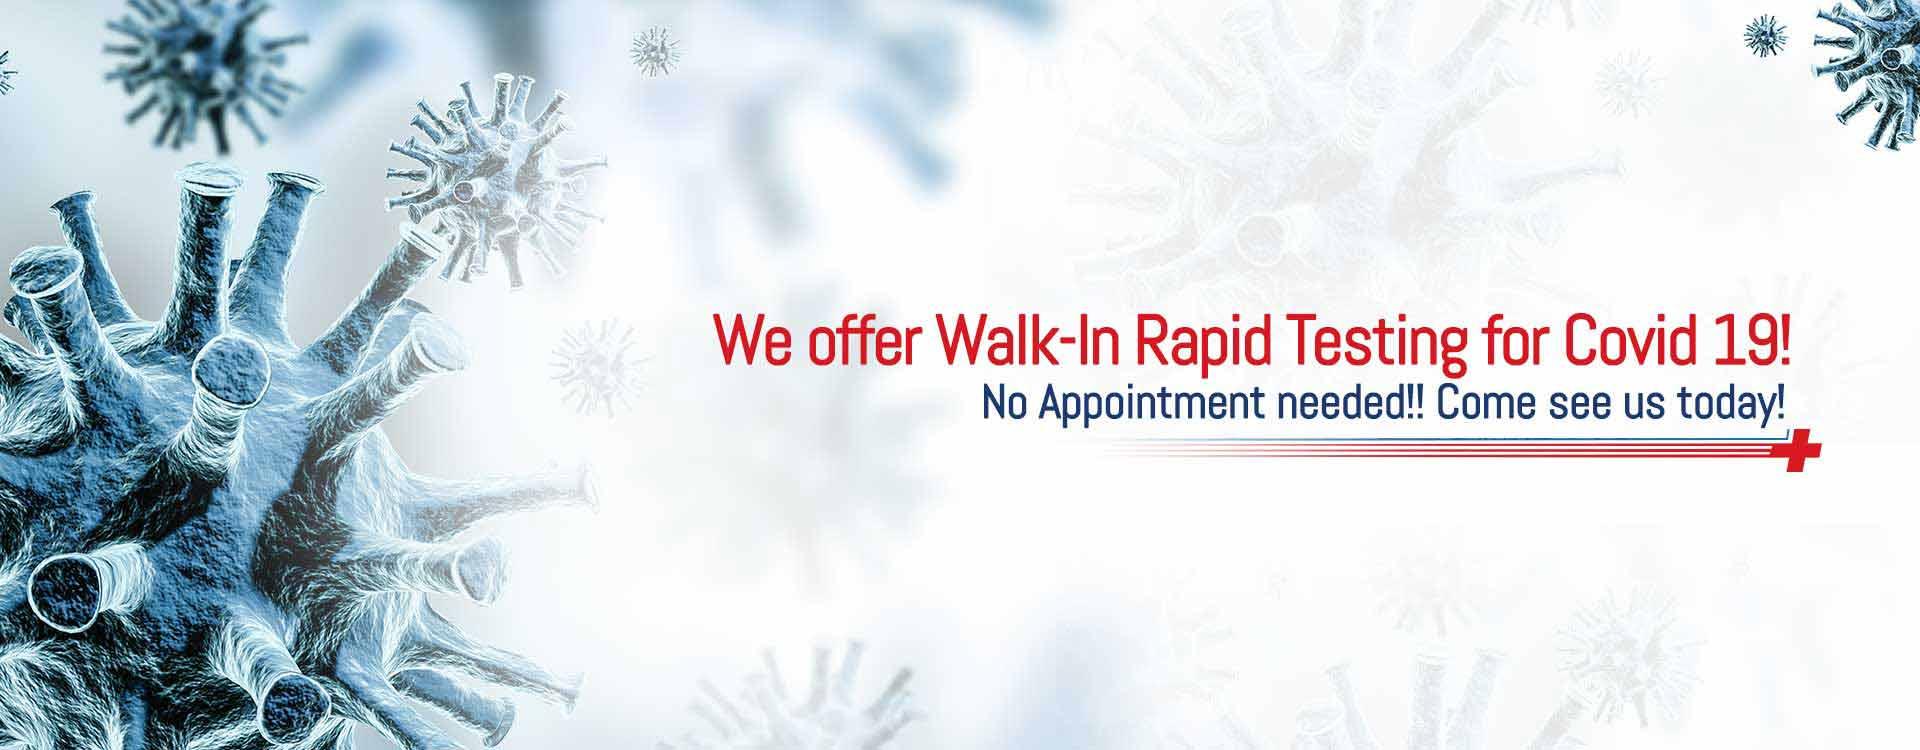 Walk in Rapid Covid Testing at Fast Aid Urgent Care in Bastrop, TX San Antonio, TX, And La Grange, TX